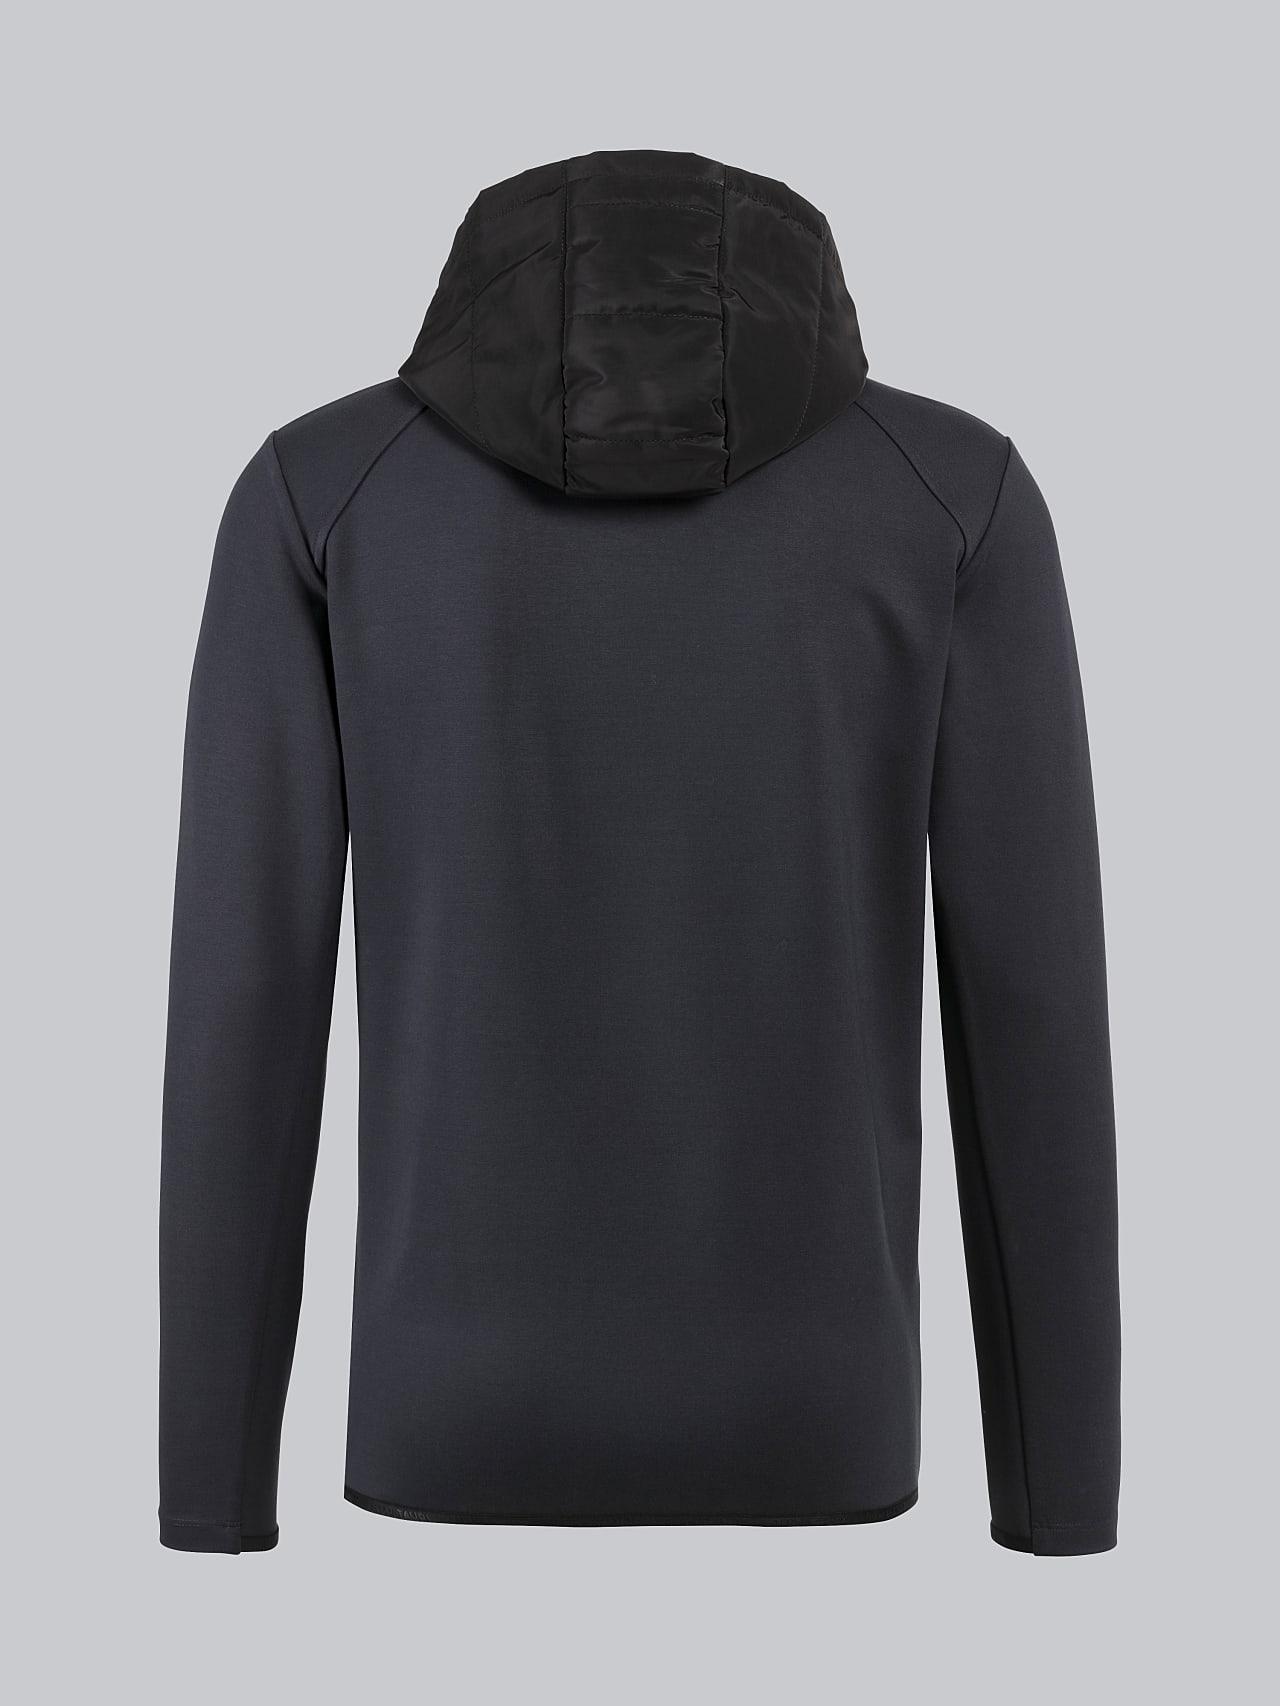 SERPA V1.Y4.02 Freedom of Movement Jacket dark grey / anthracite Left Alpha Tauri